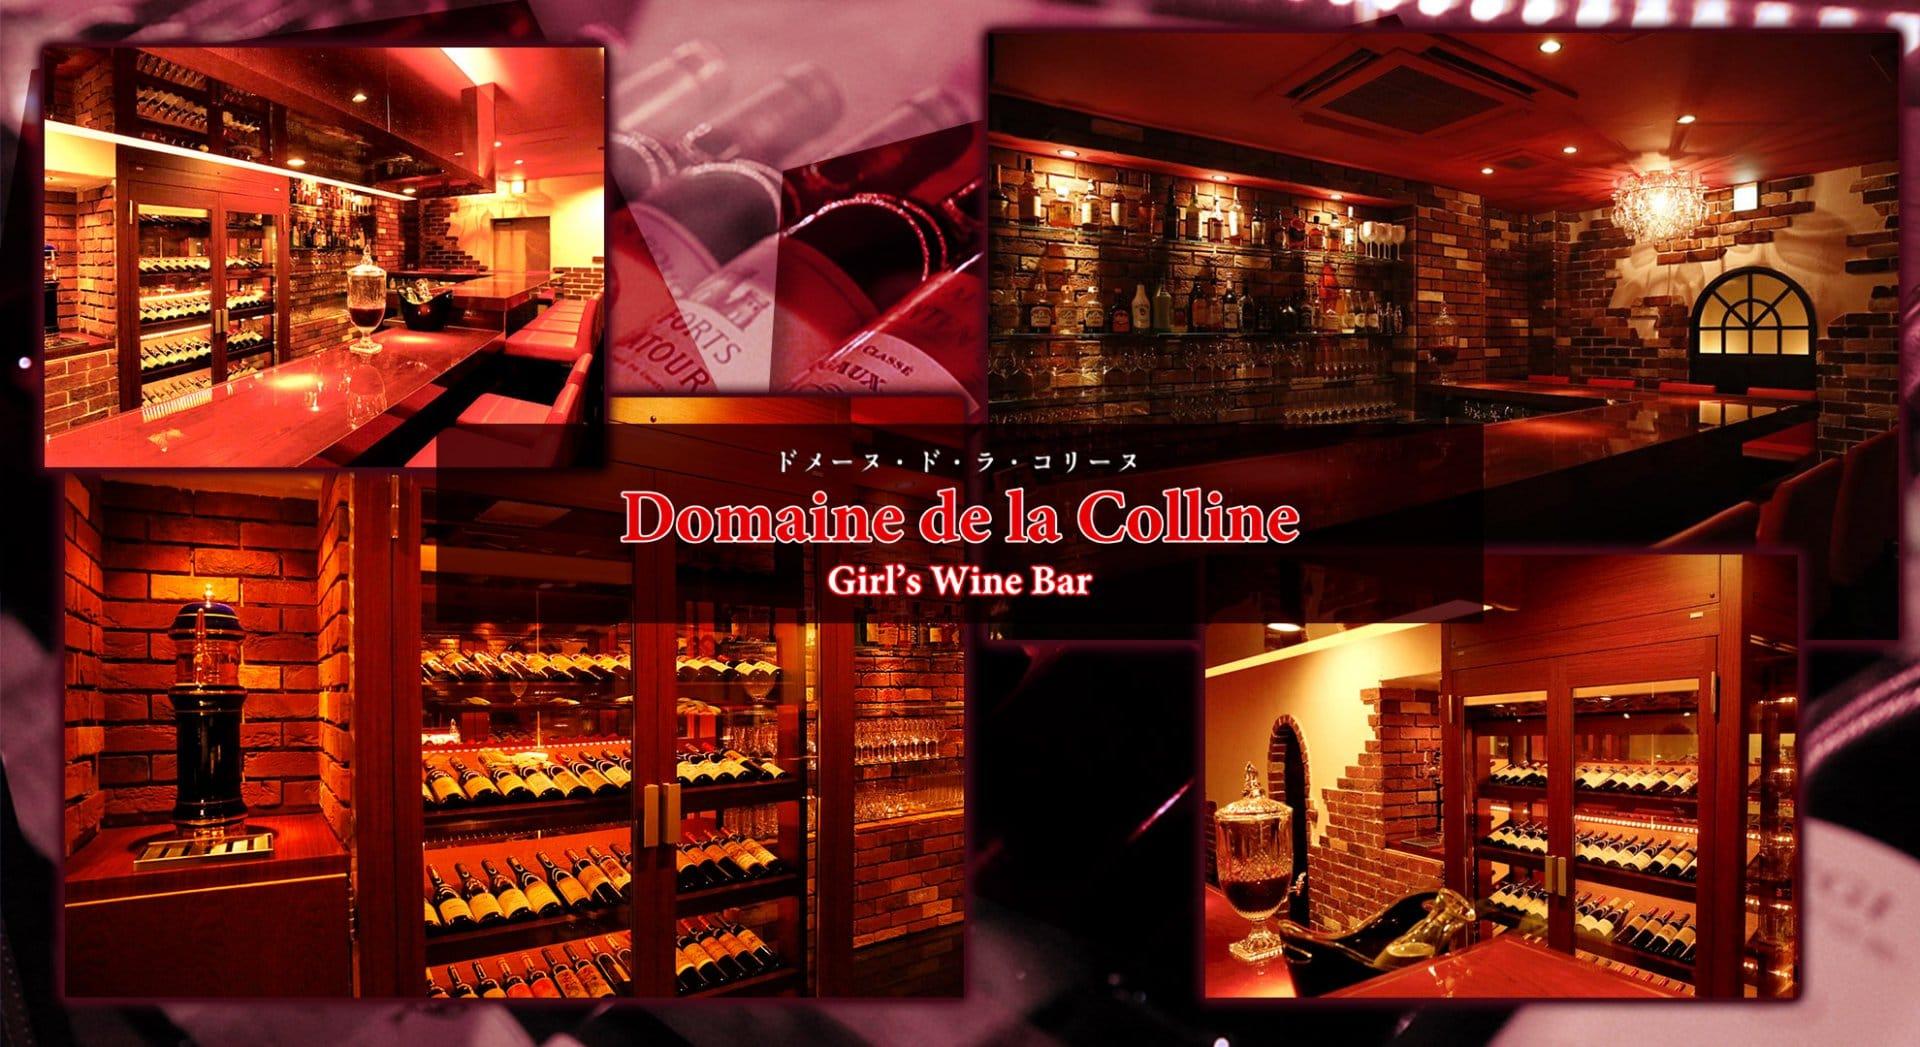 Domaine de la Colline(ドメーヌ・ド・ラ・コリーヌ) 渋谷ガールズバー TOP画像